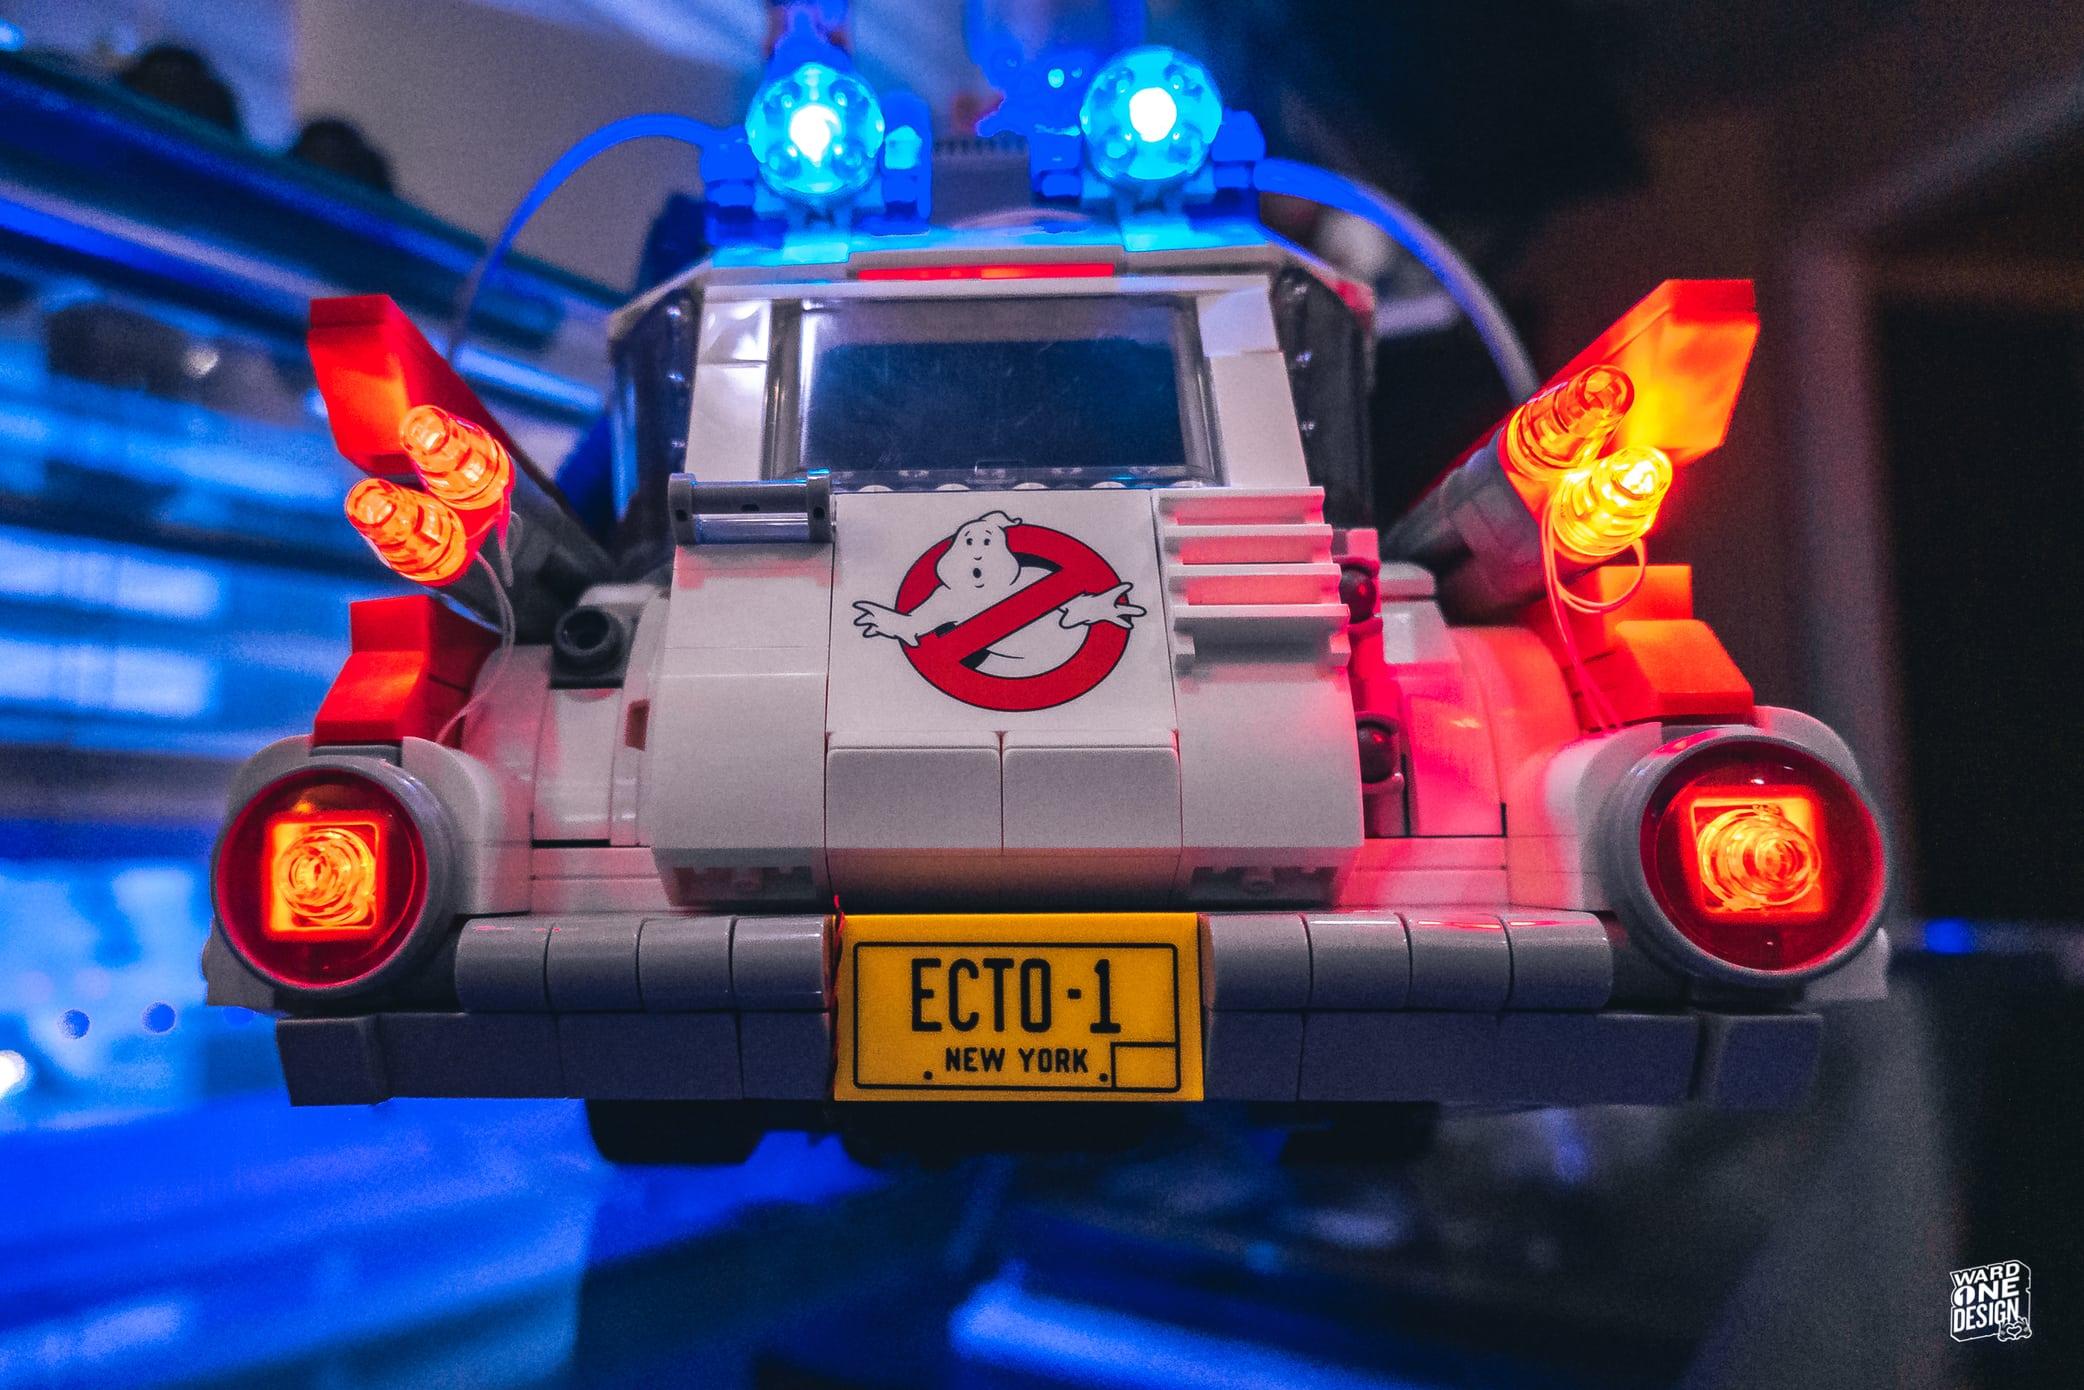 Lego Creator - Ghostbusters ECTO-1